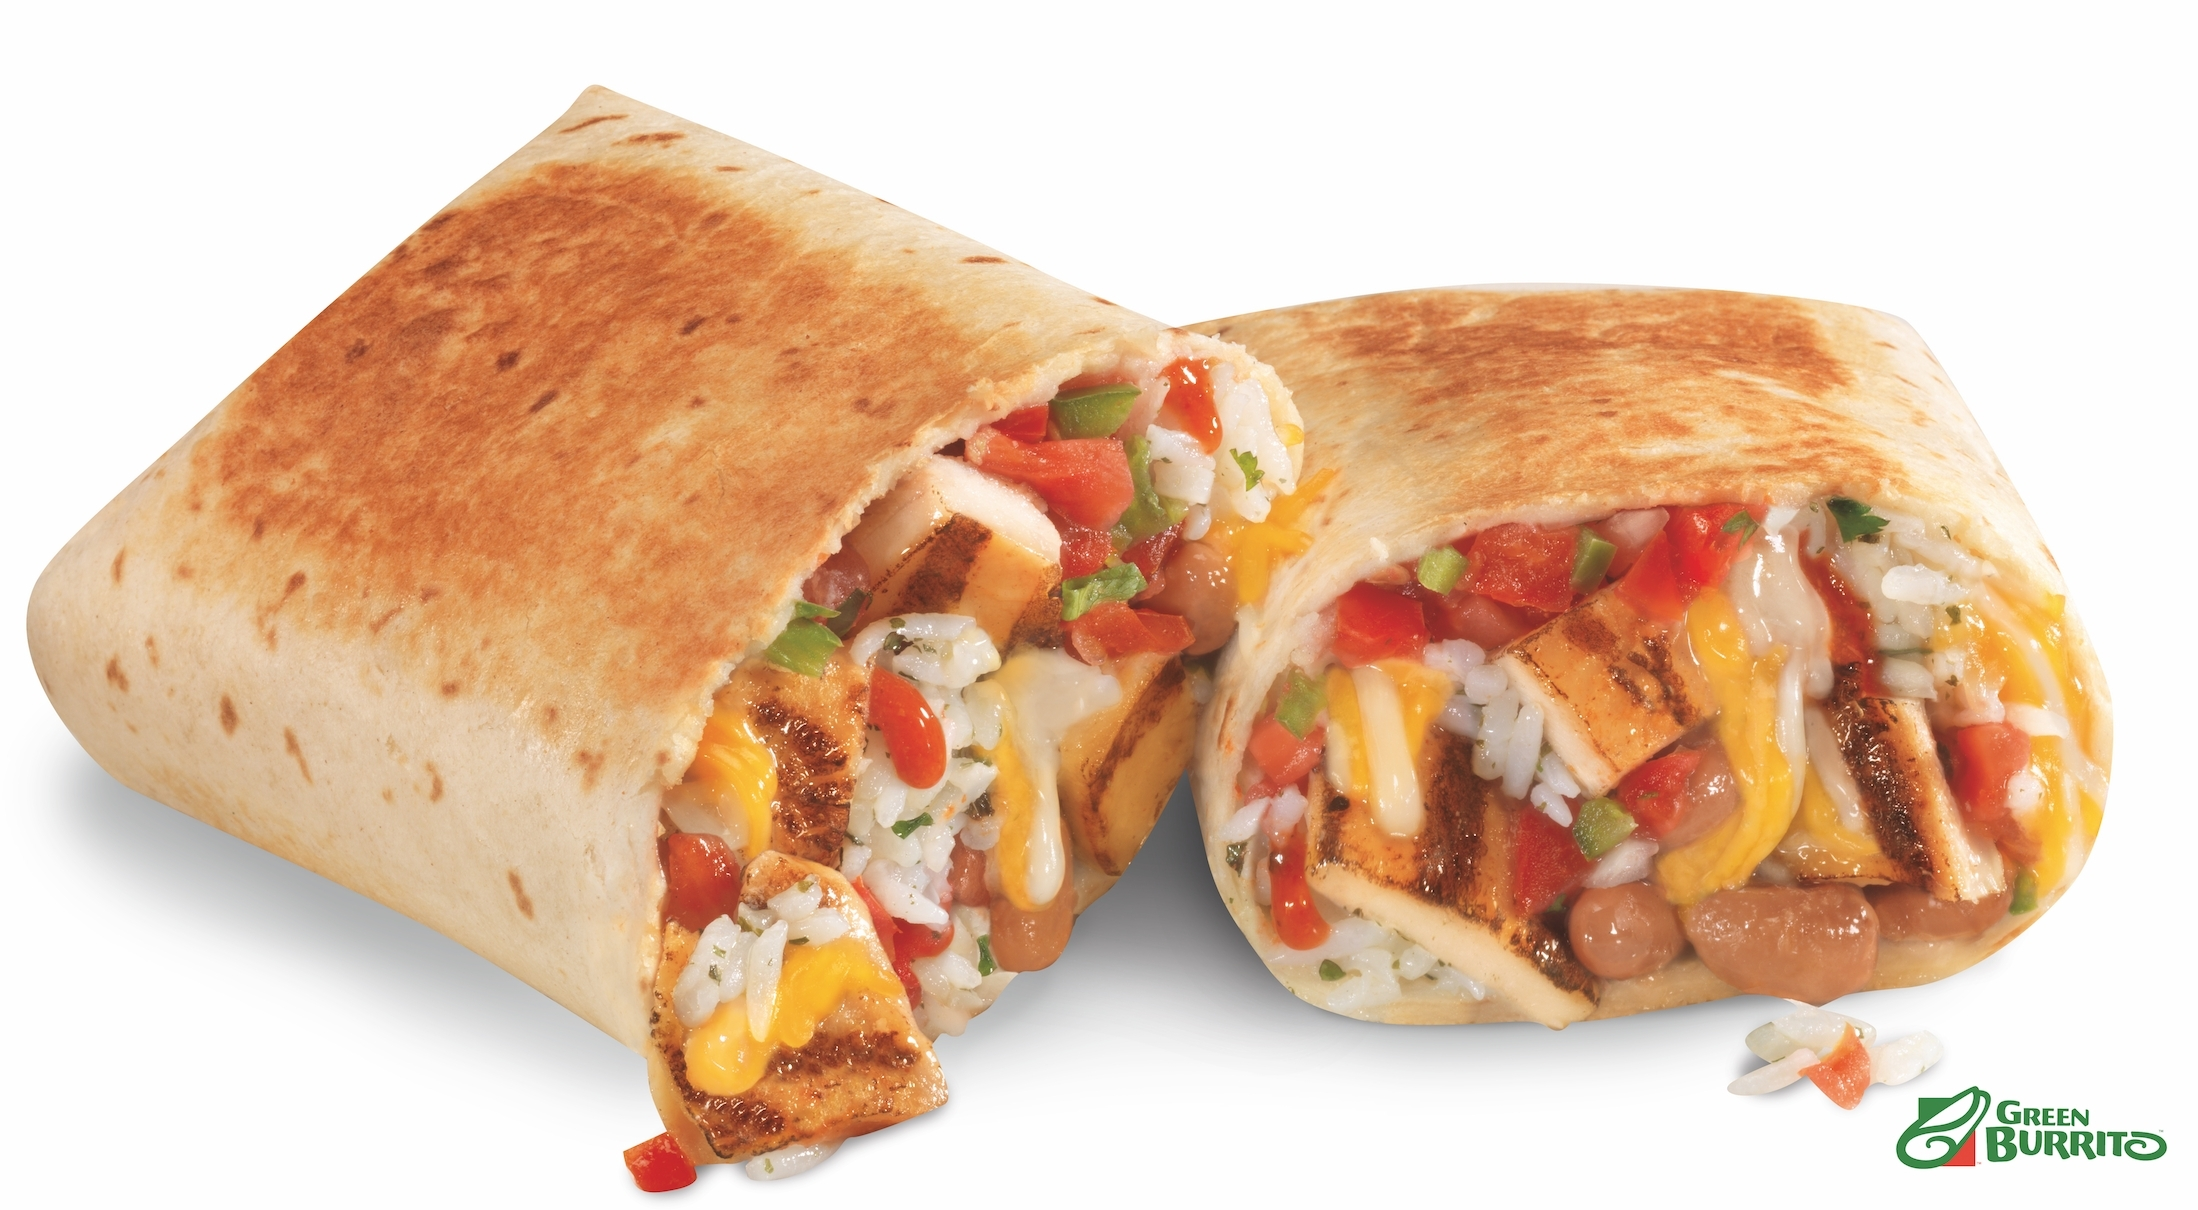 Green Burrito/CKE Restaurants